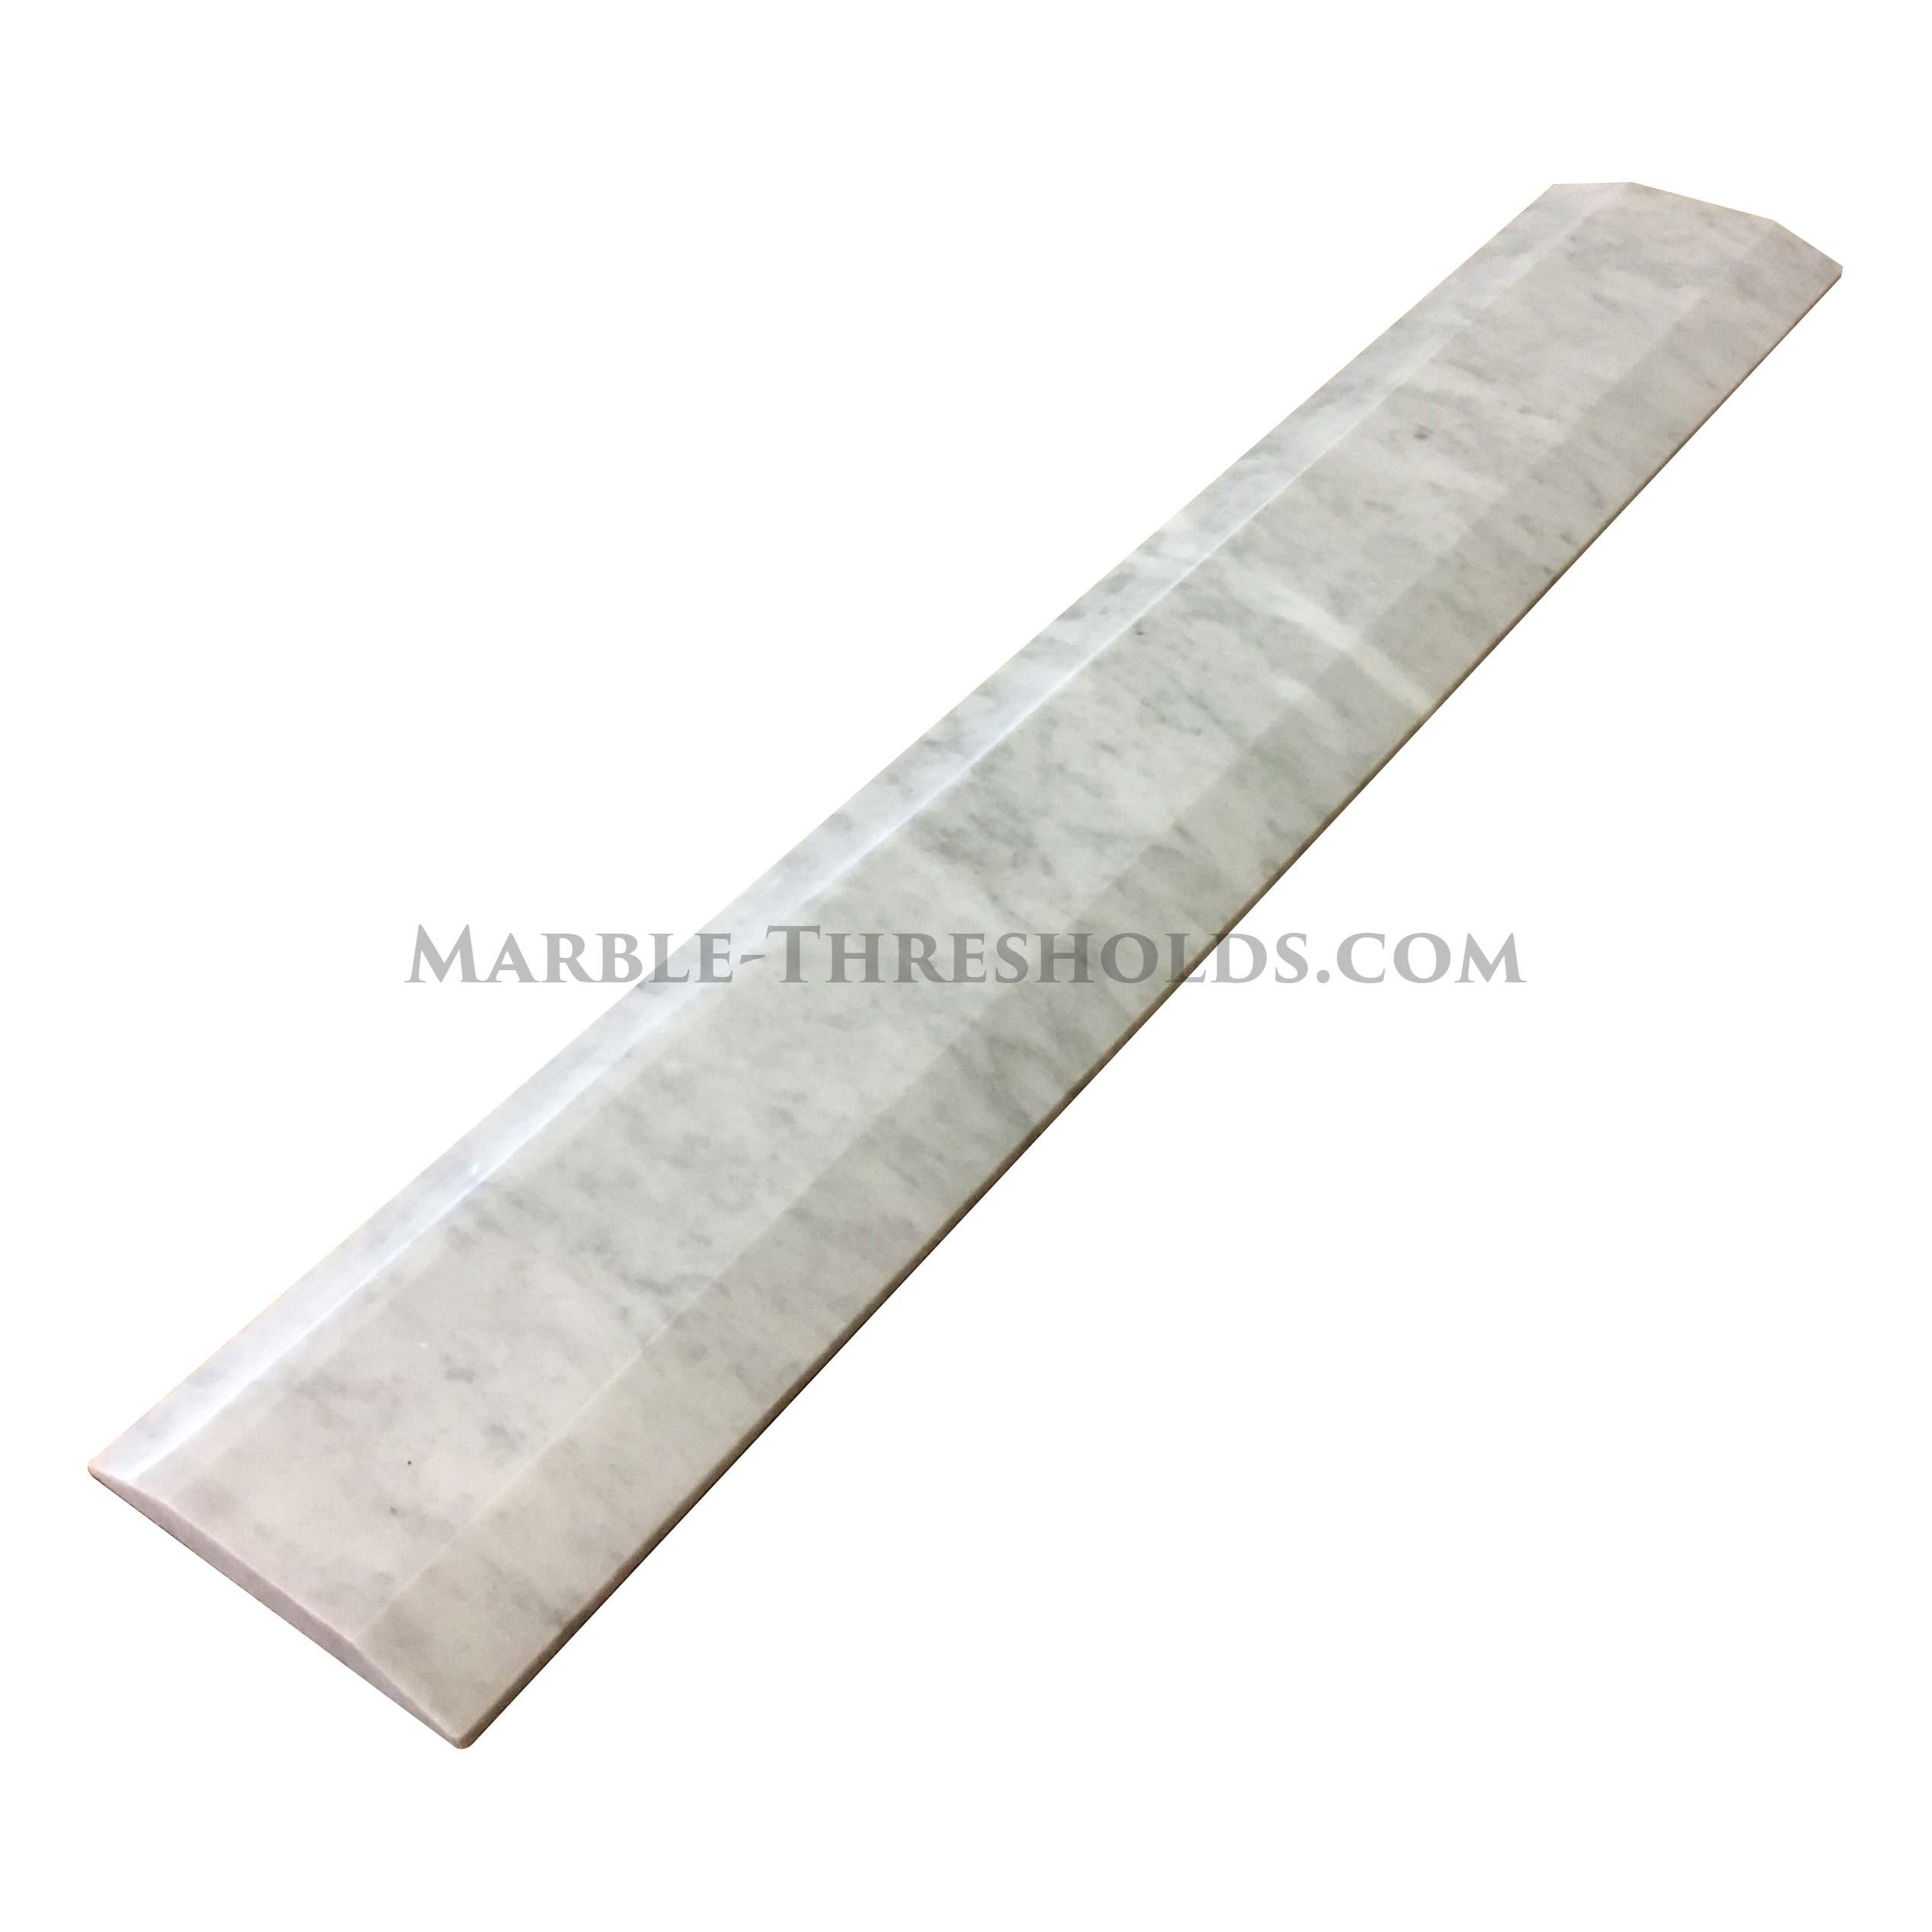 Marble Saddle For Bathroom: Marble Door Threshold & Shower Threshold Shower Door